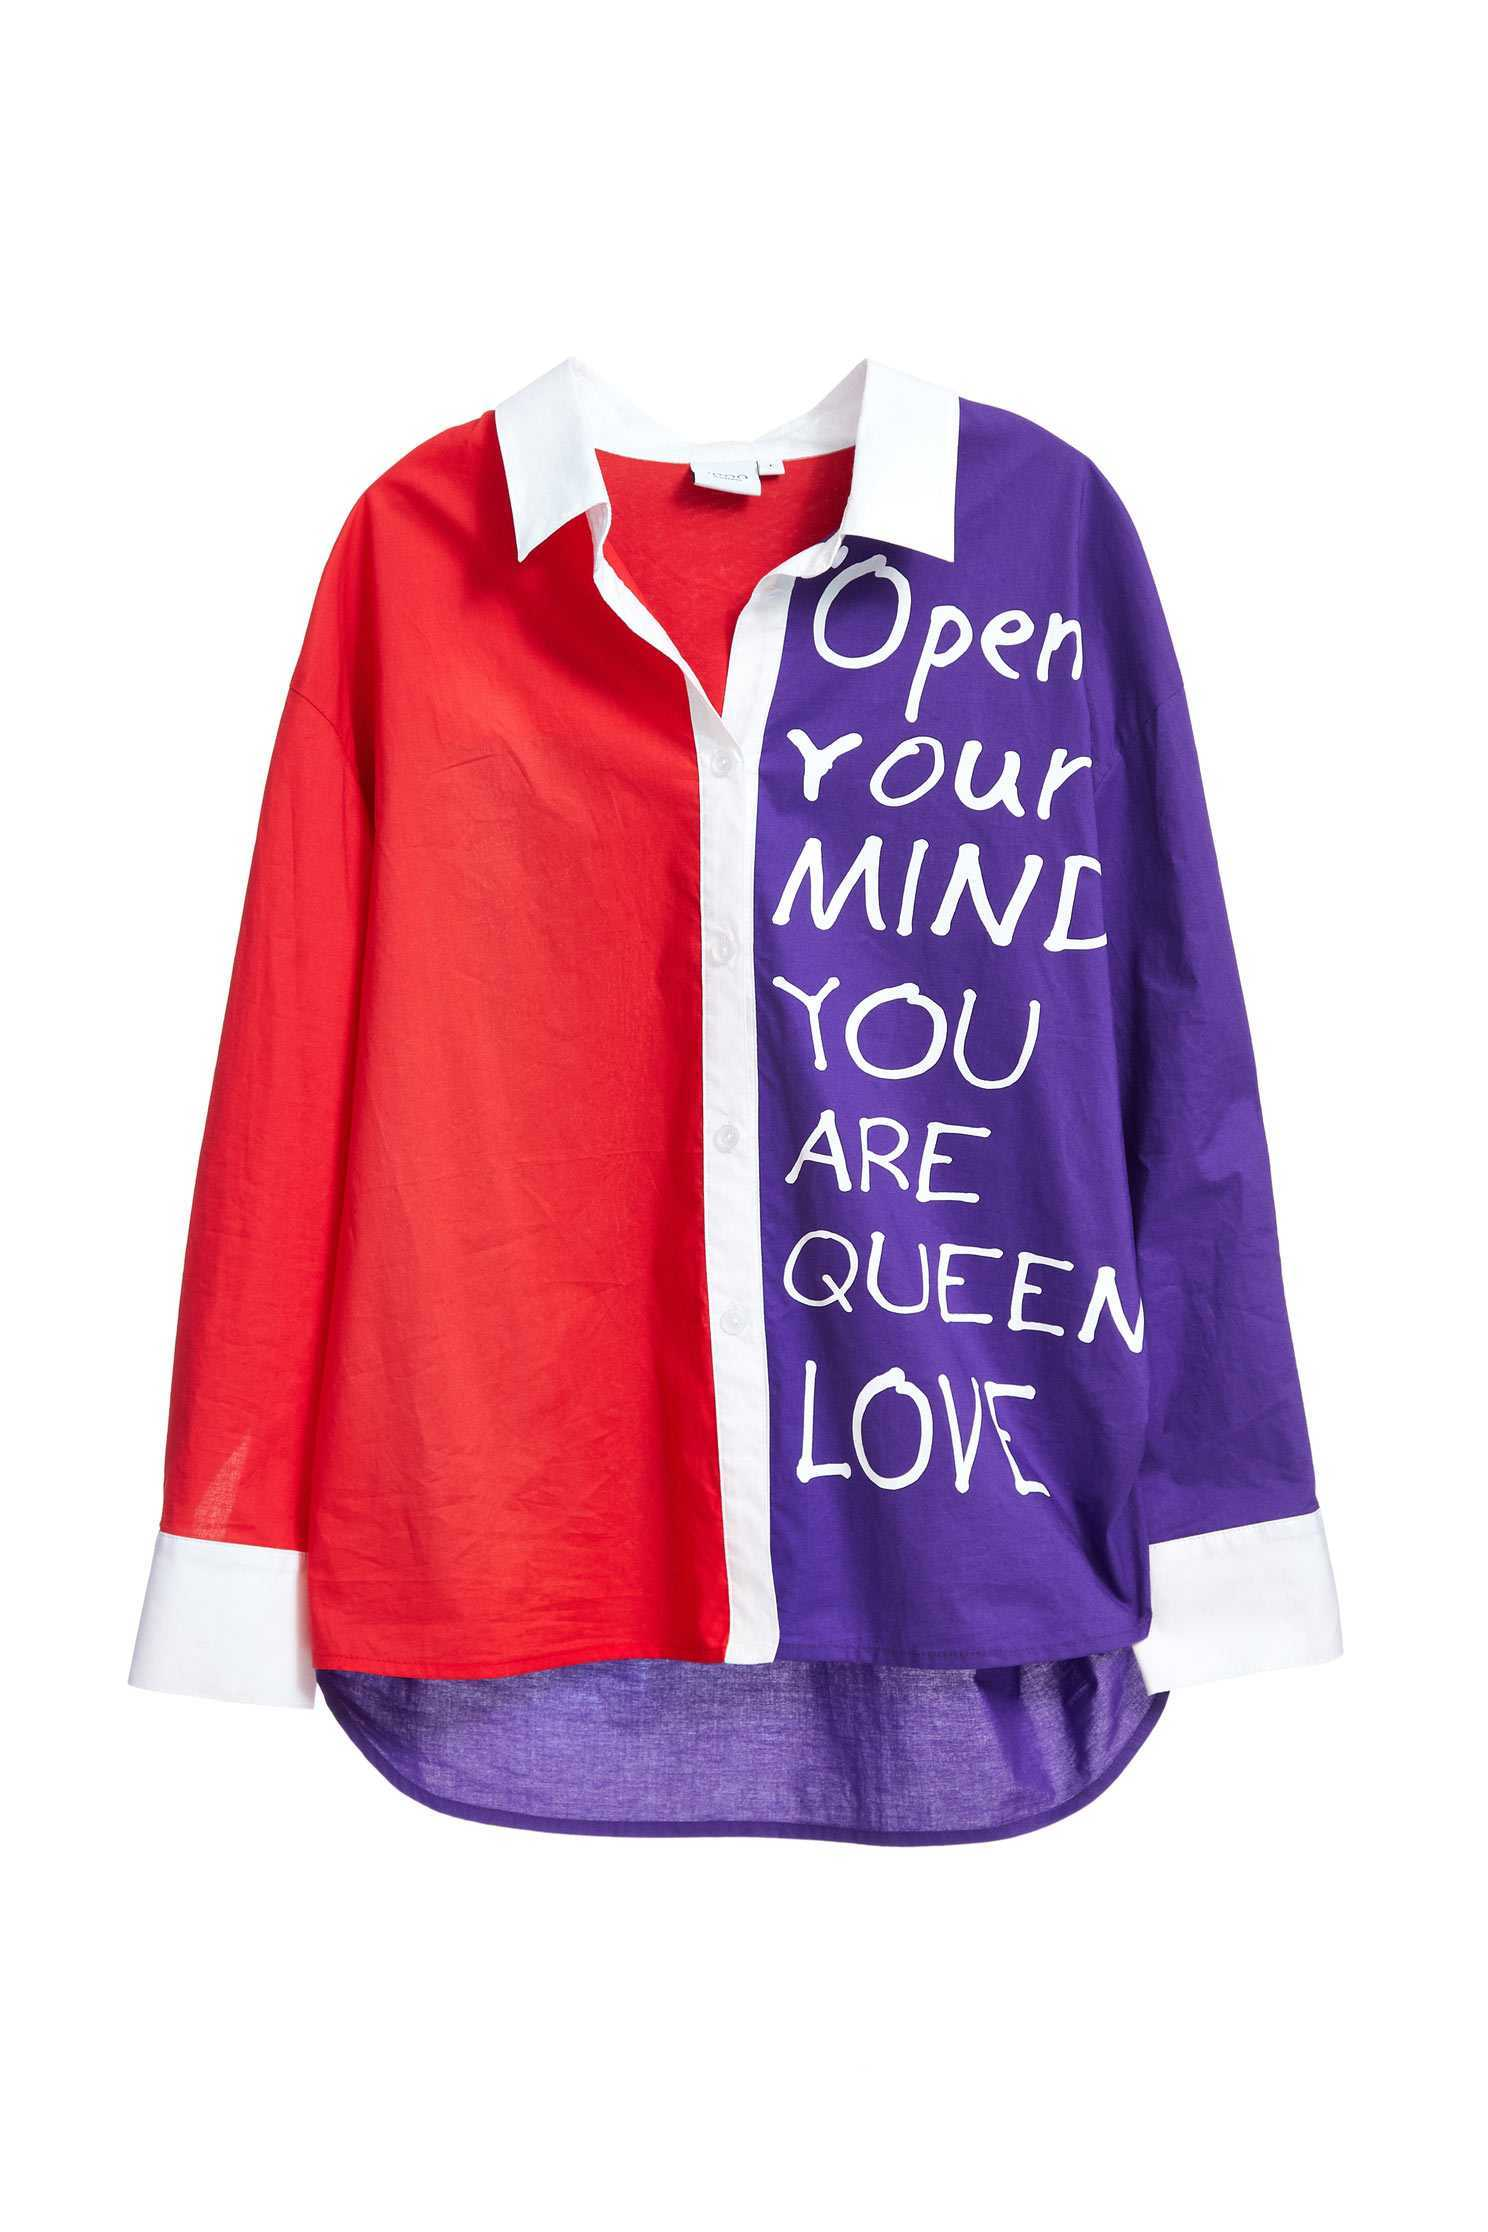 Casual Contrast Color long sleeve shirt,top,cotton,blouse,longsleevetop